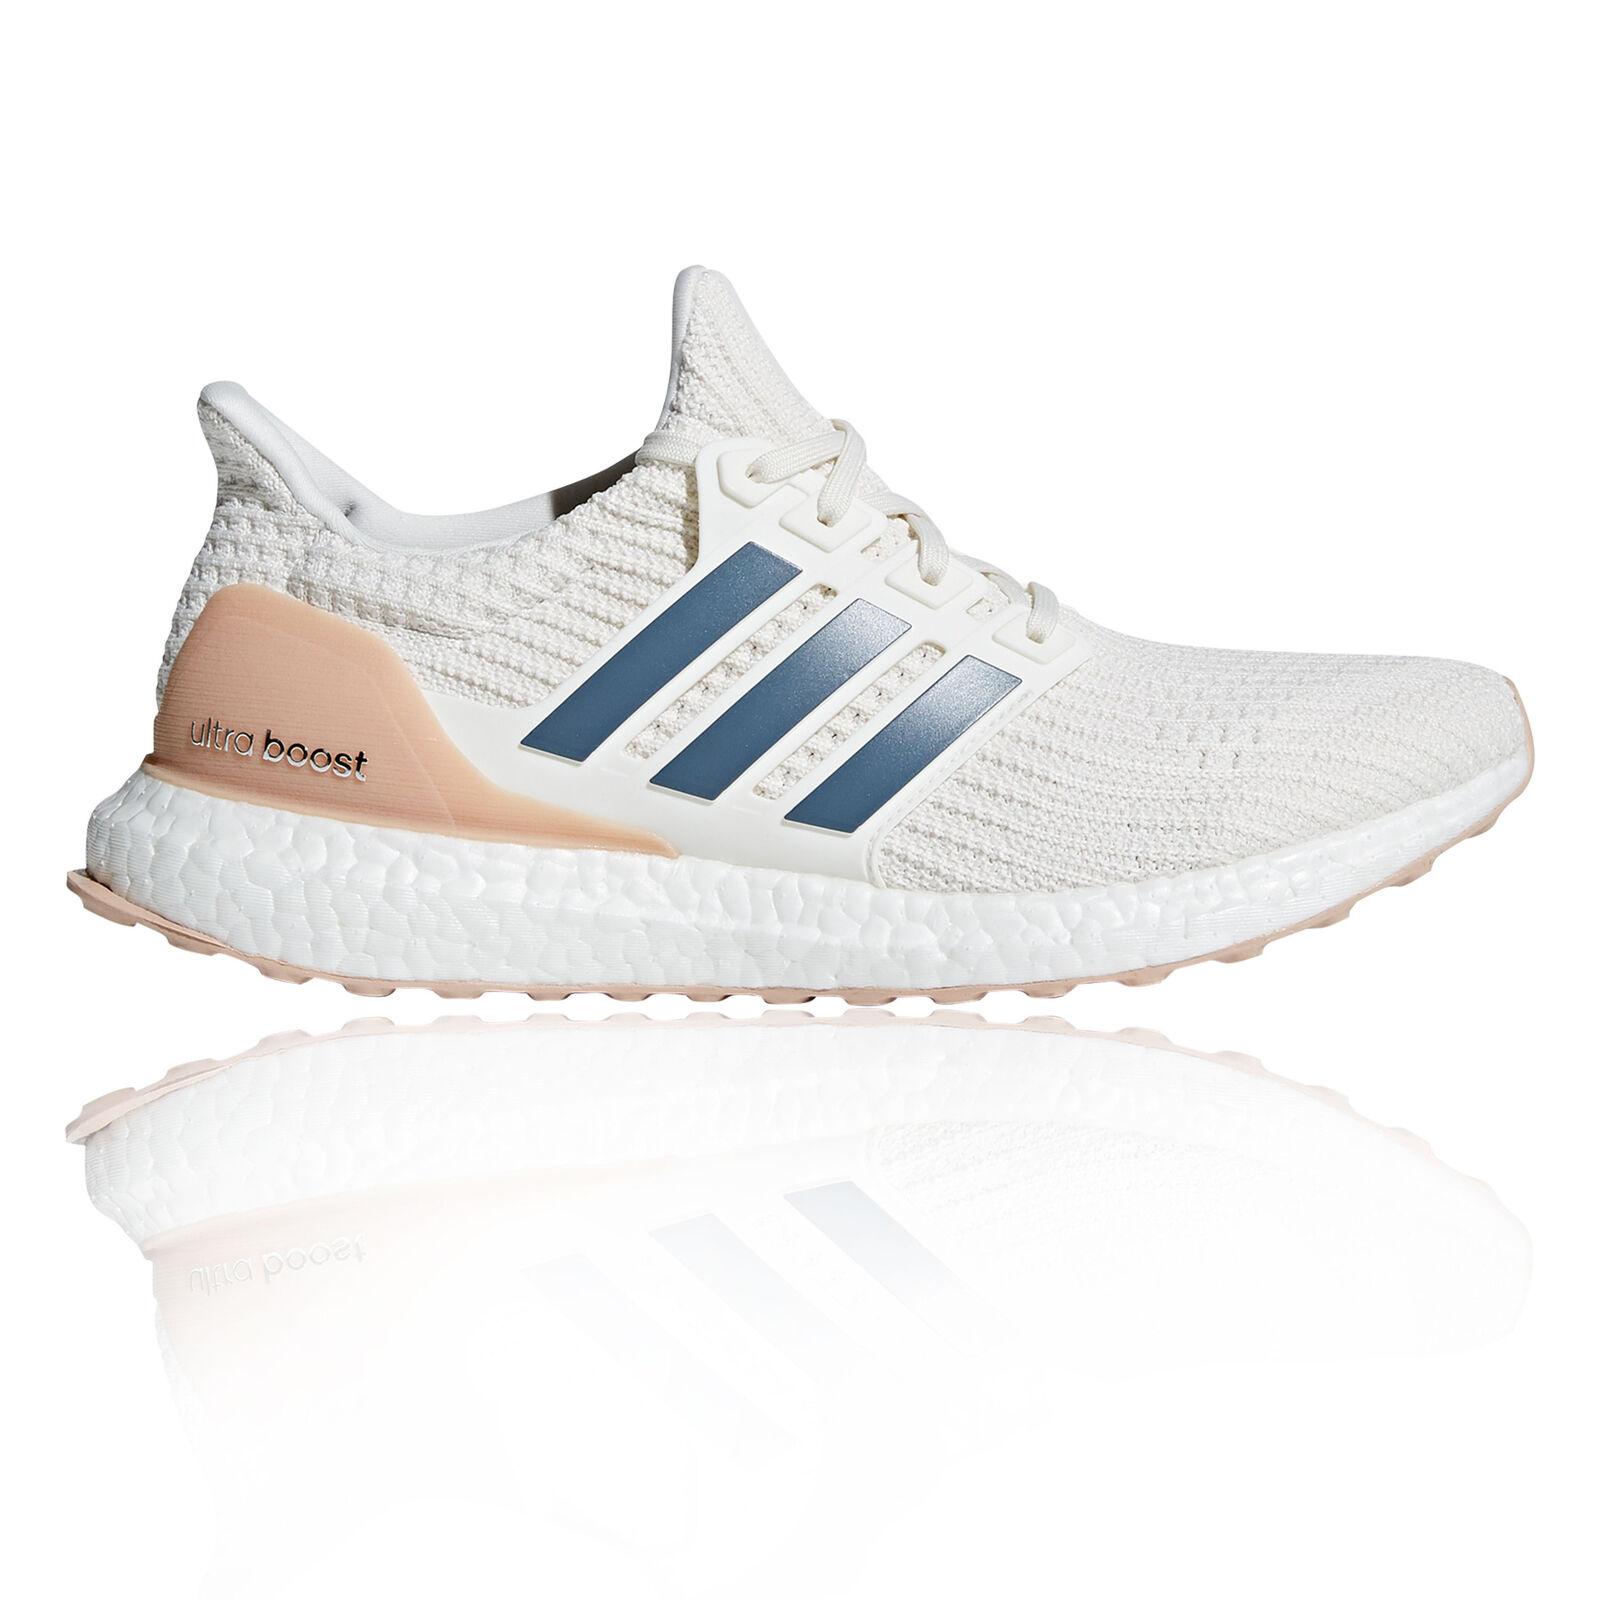 9b38f9f76 Adidas Mens UltraBOOST Running shoes Trainers Sneakers White Sports  Breathable nciobu9023-Men